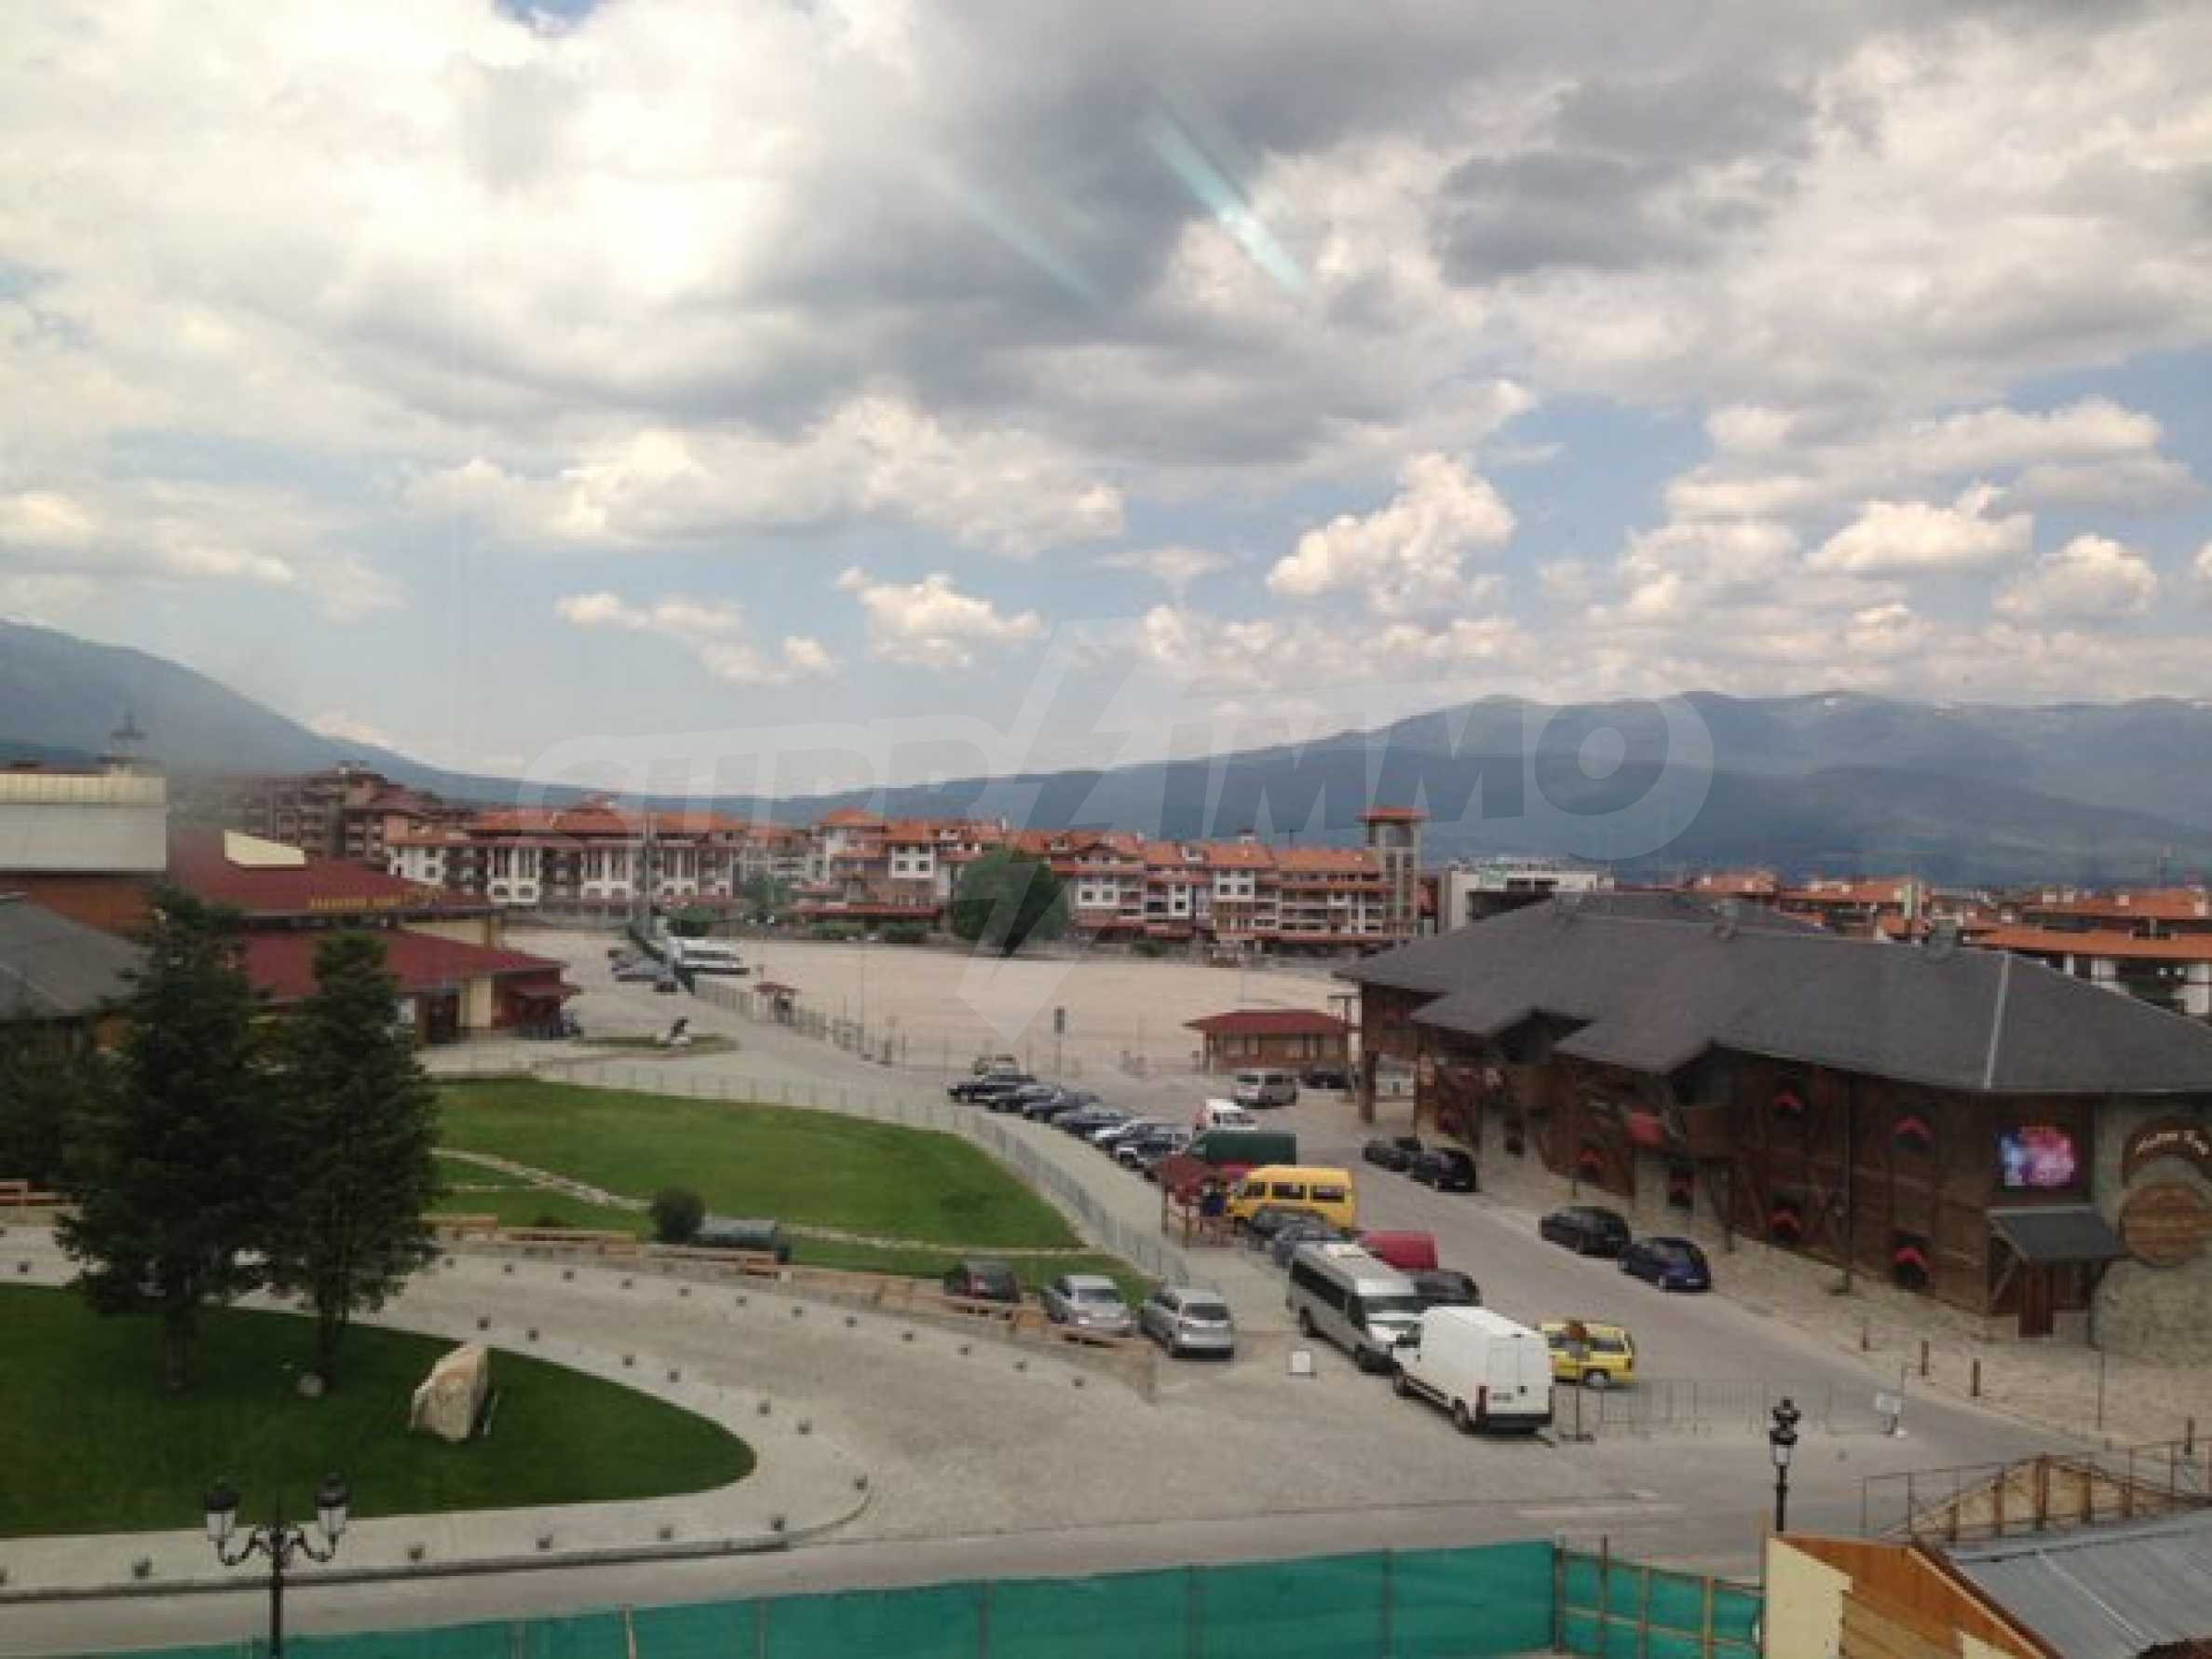 Тристаен апартамент в планински курорт Банско 8